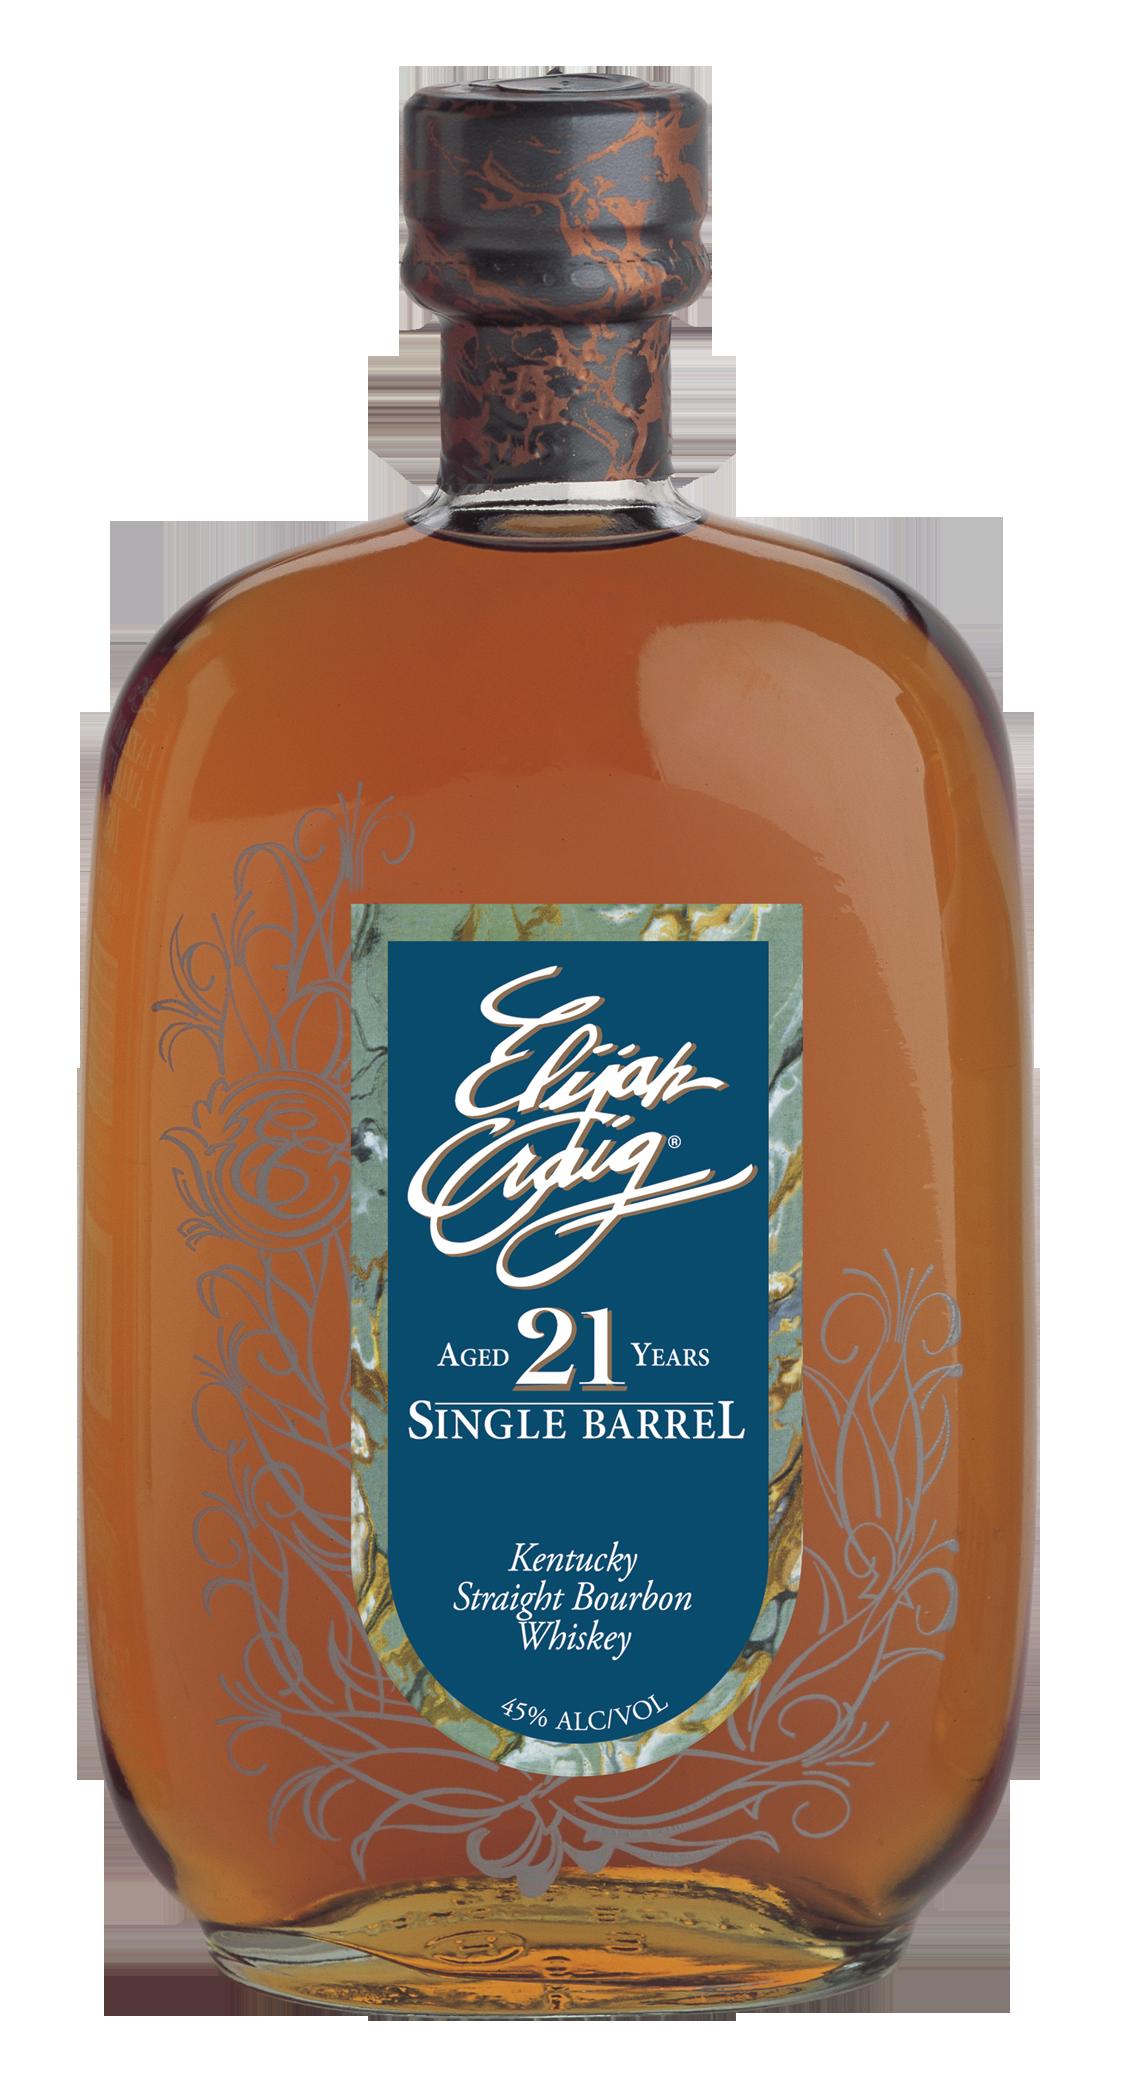 Elijah Craig Single Barrel Bourbon 21 Years Old